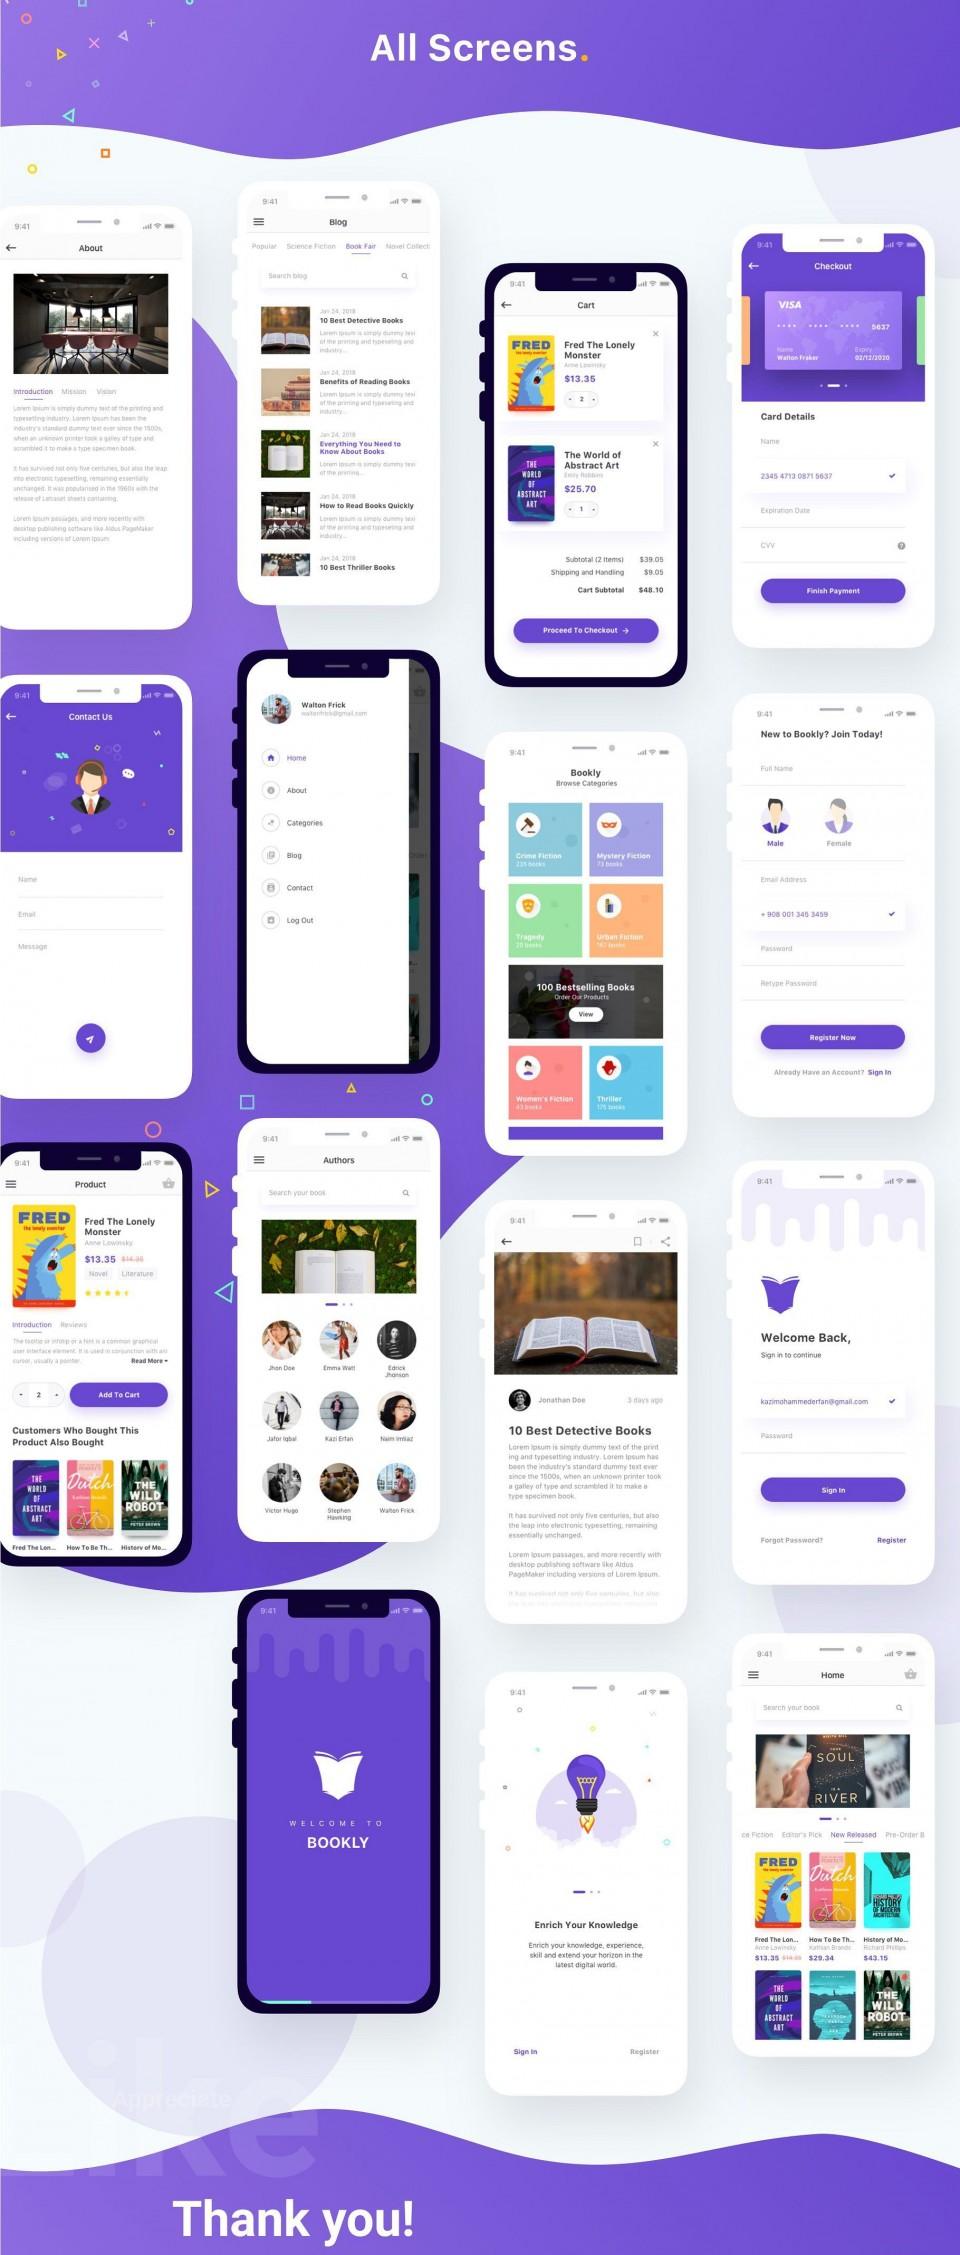 001 Fantastic Iphone App Design Template High Def  X Io Sketch960